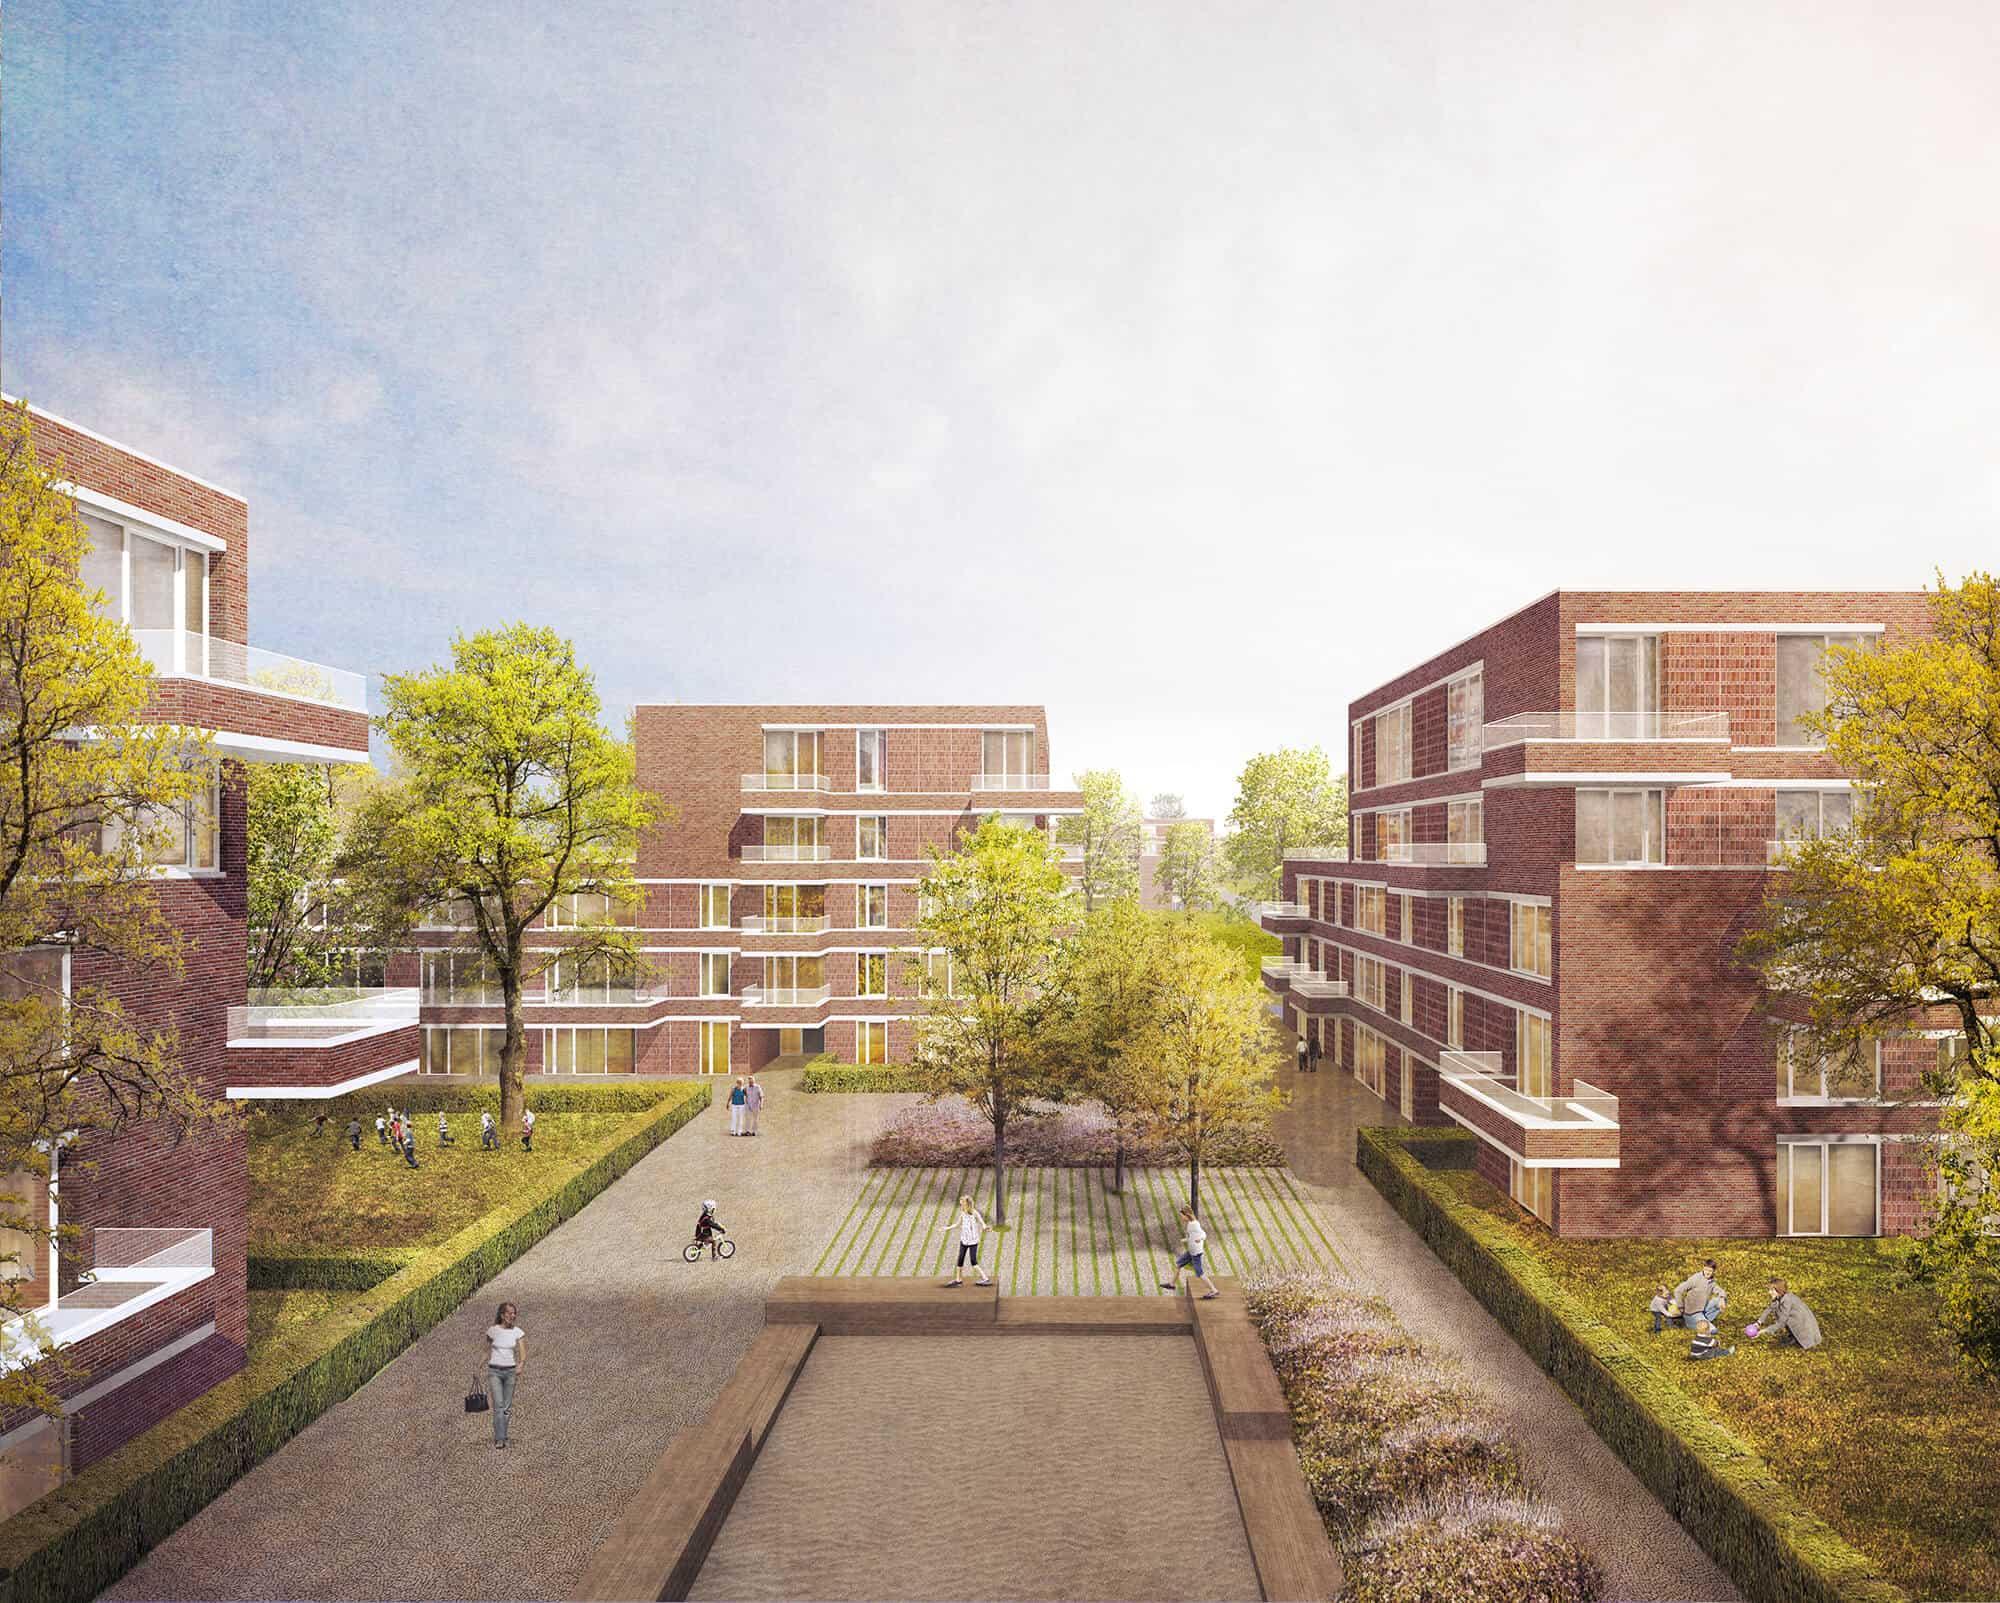 Fischbeker Heidbrook Plateau Visualisierung Procom Projektentwickler Hamburg